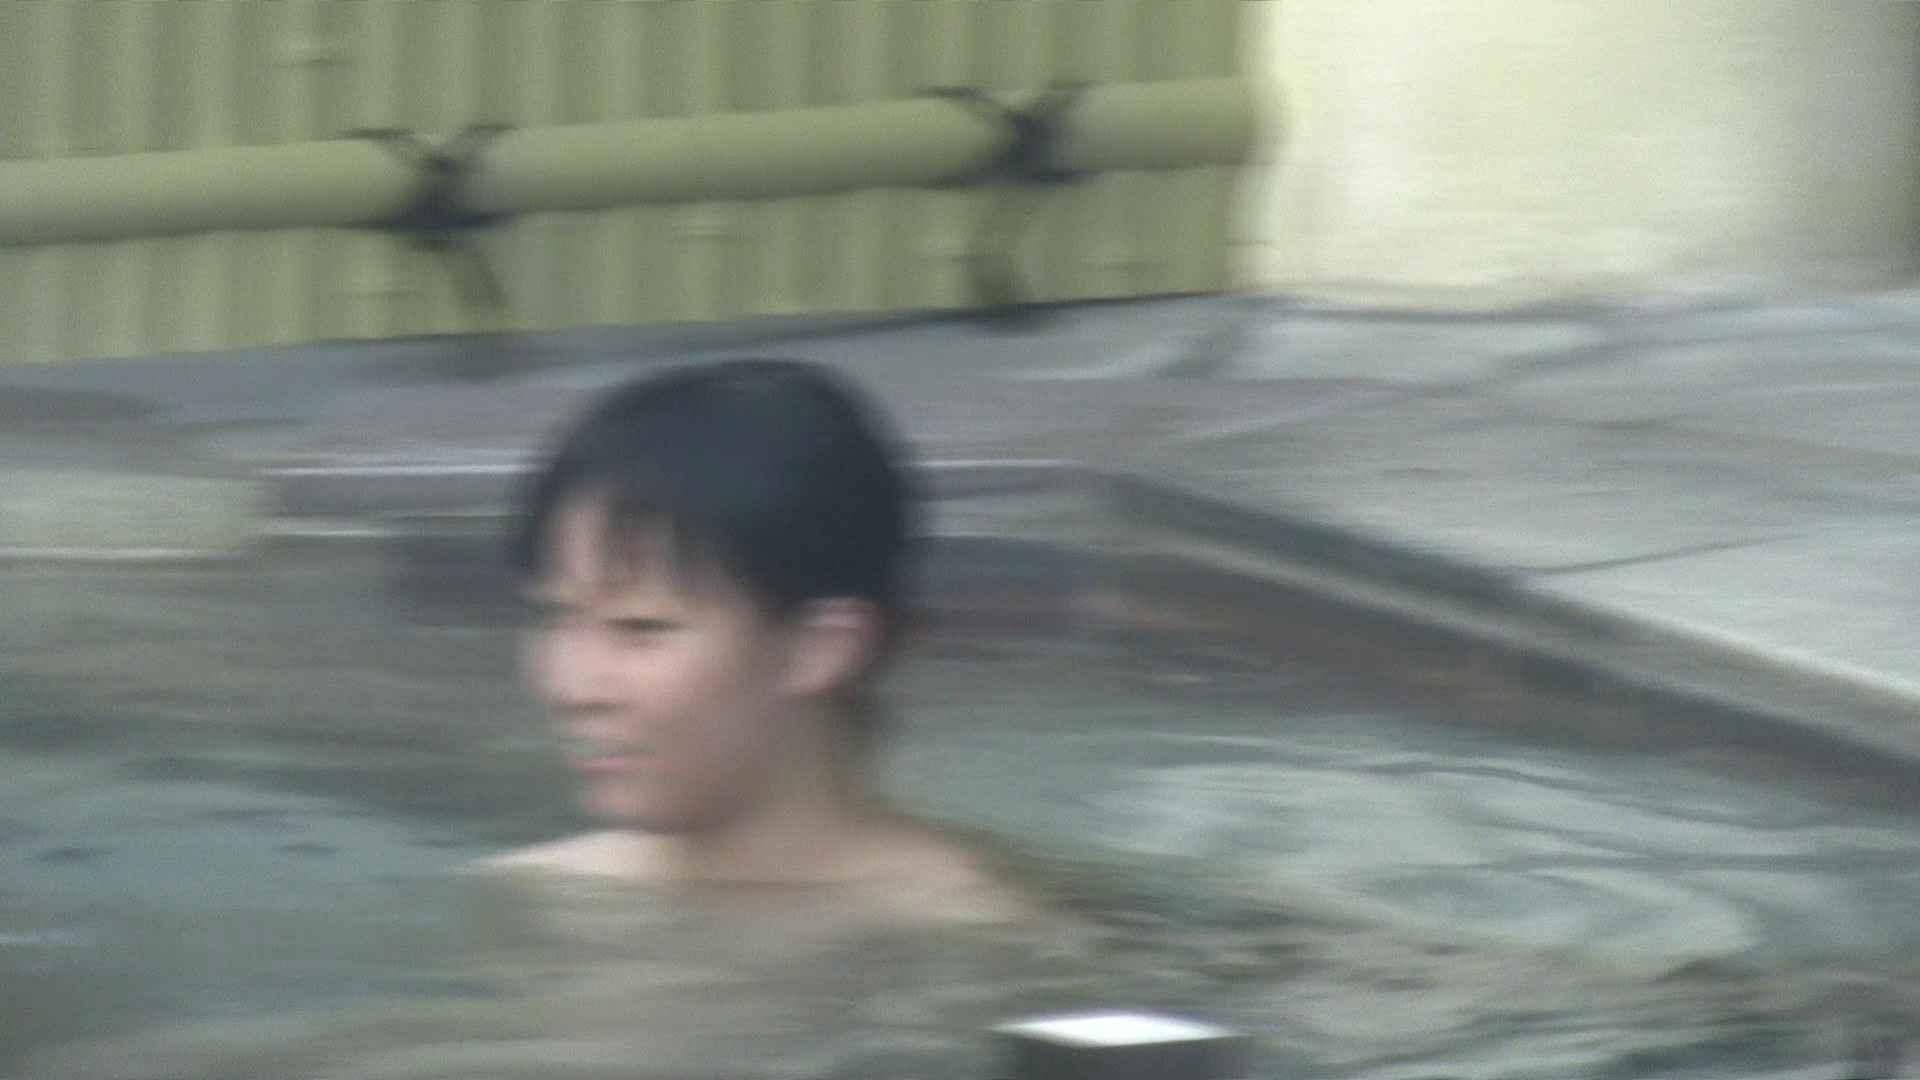 Aquaな露天風呂Vol.196 盗撮シリーズ | 露天風呂編  87PIX 11